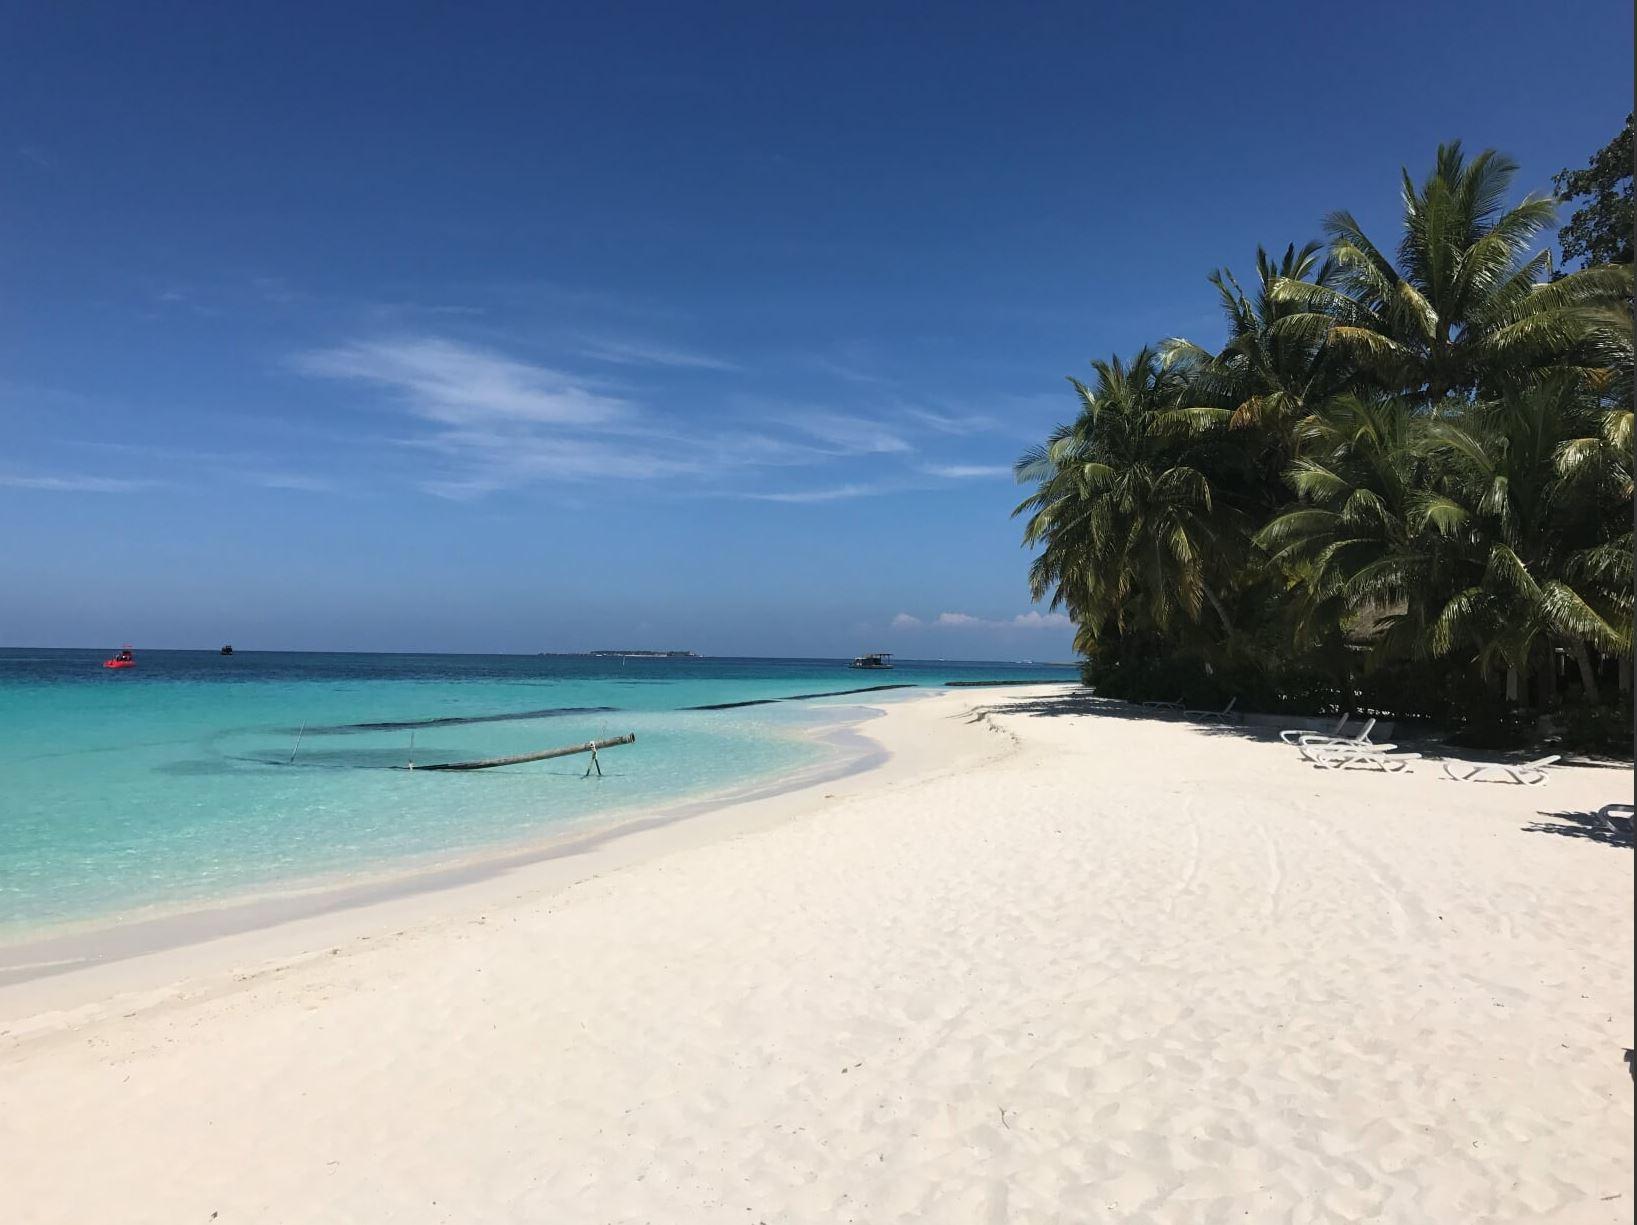 The beach in Kuramathi Island Resort